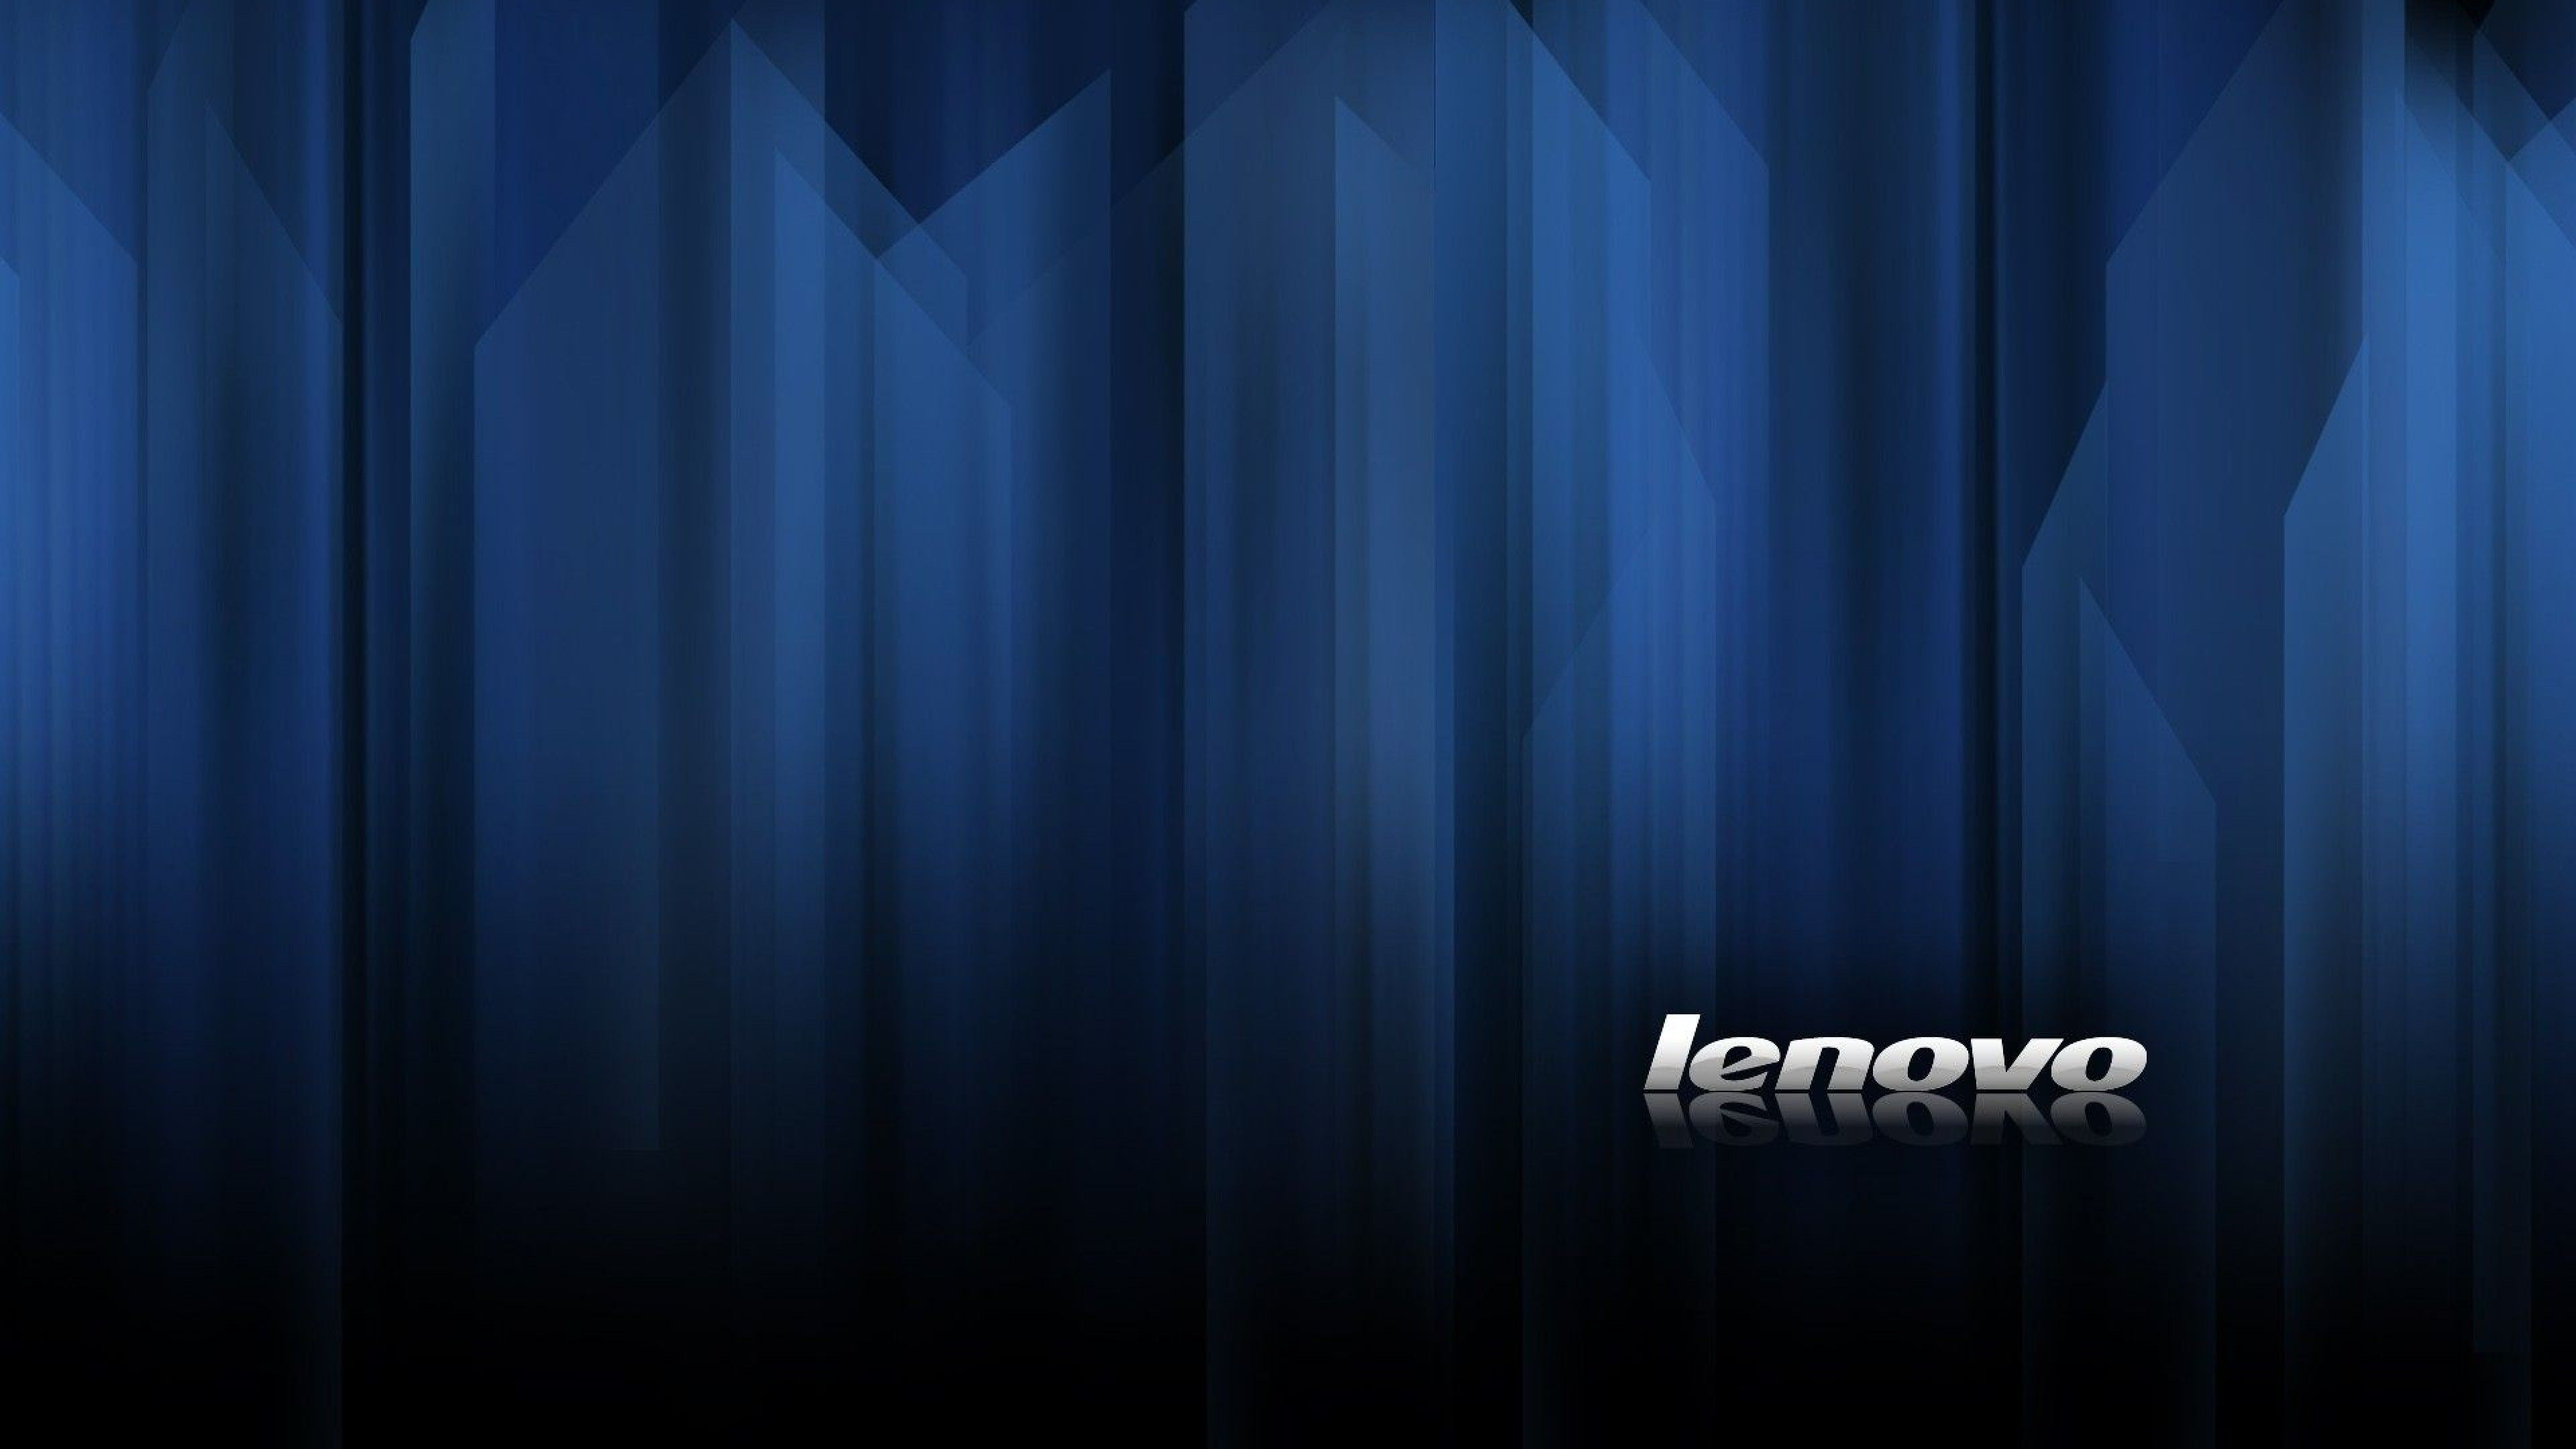 Lenovo 4K Wallpapers   Top Lenovo 4K Backgrounds 3840x2160